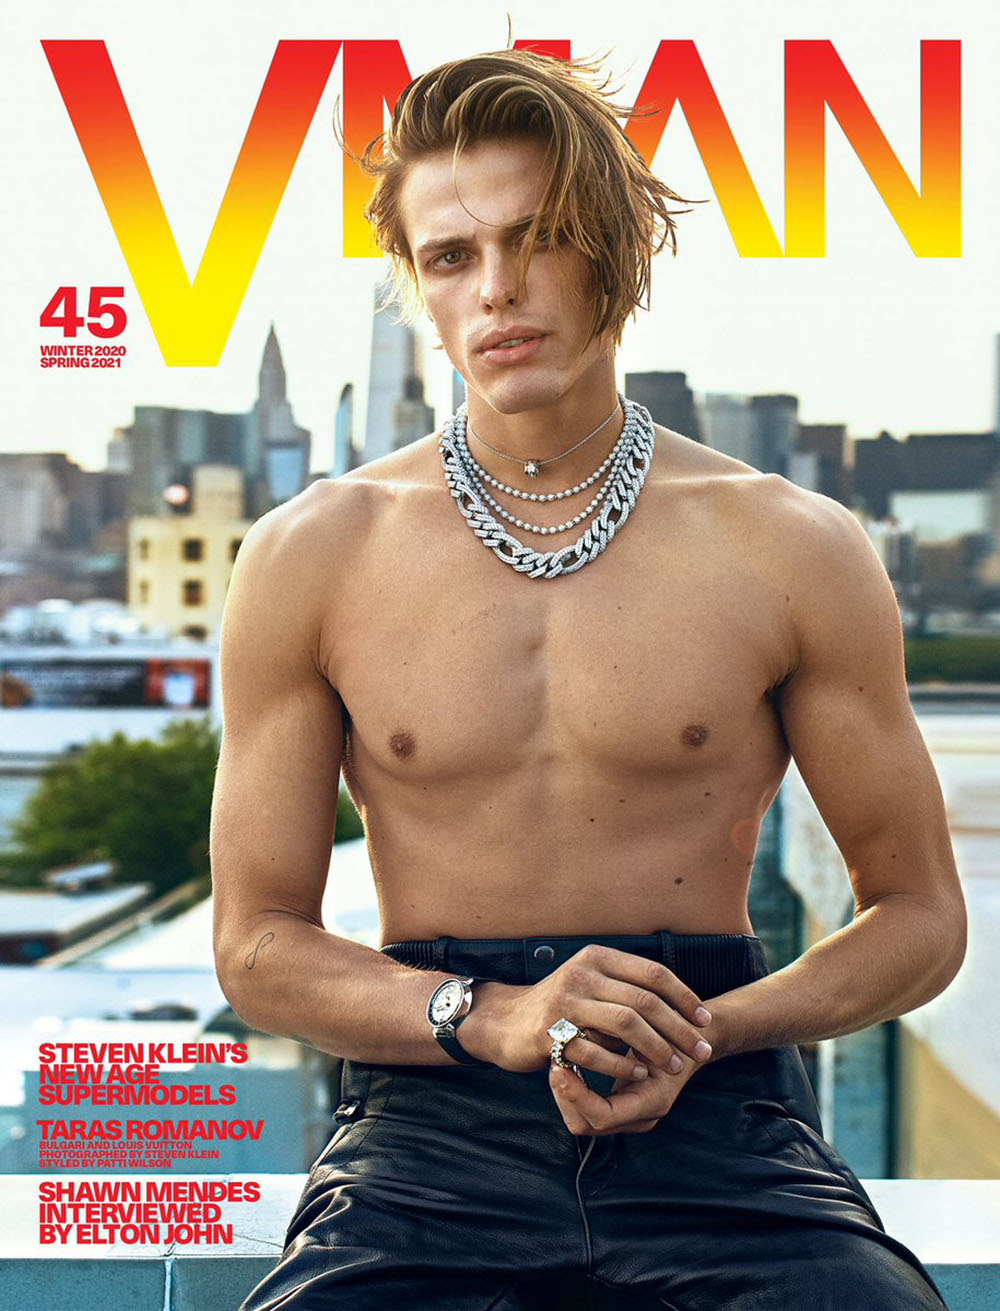 Taras Romanov covers VMan Winter 2020 Spring 2021 by Steven Klein